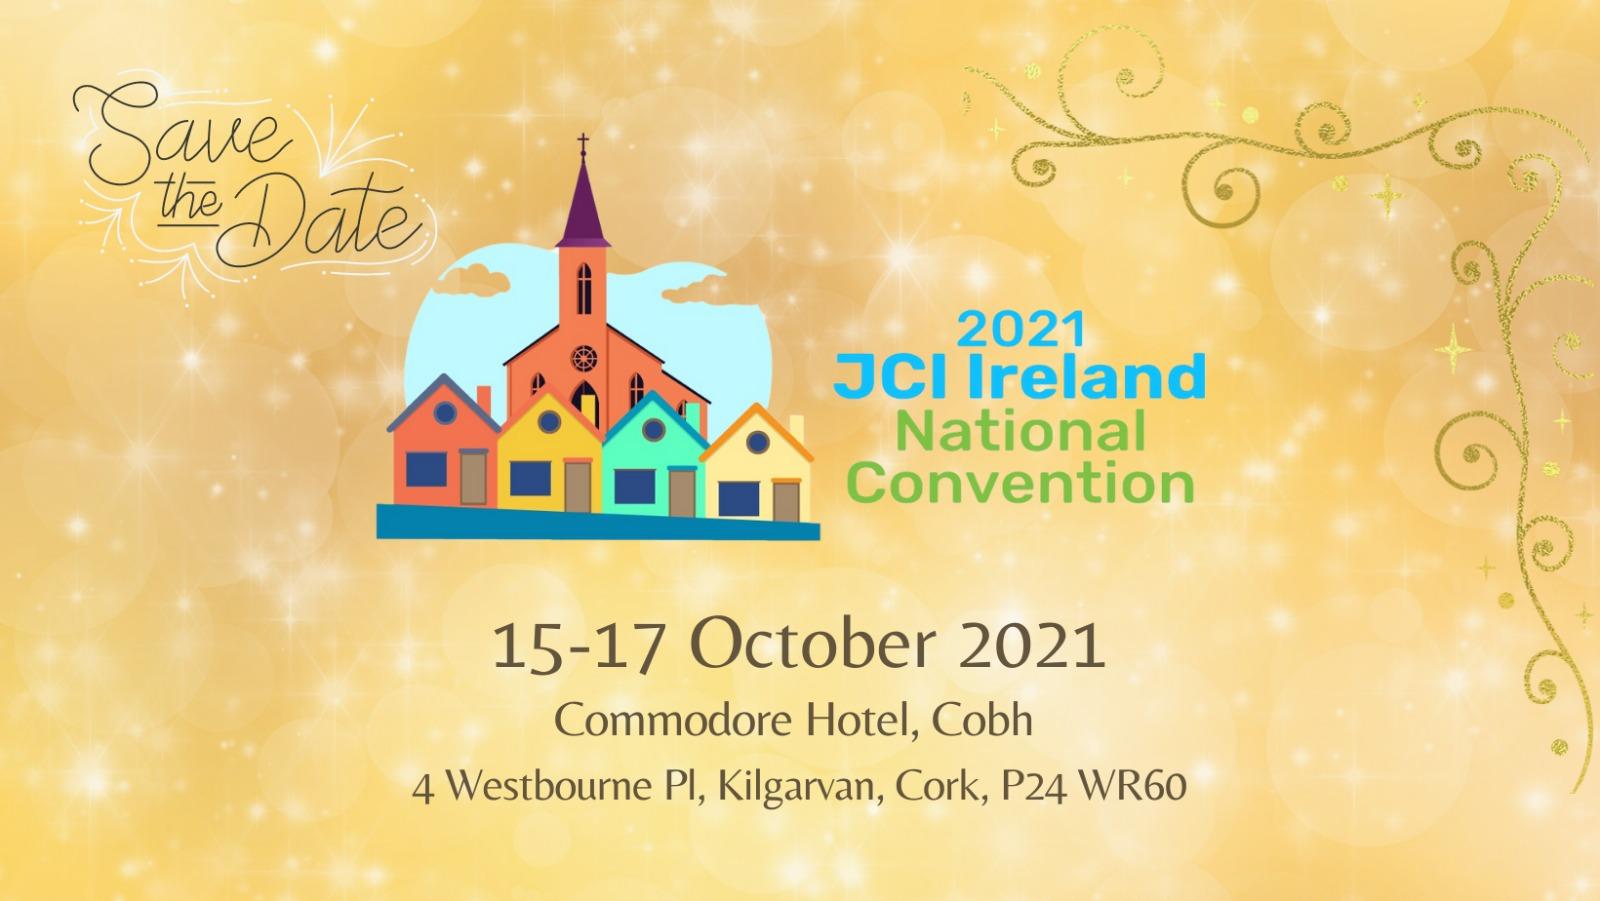 JCI Ireland National Convention 2021